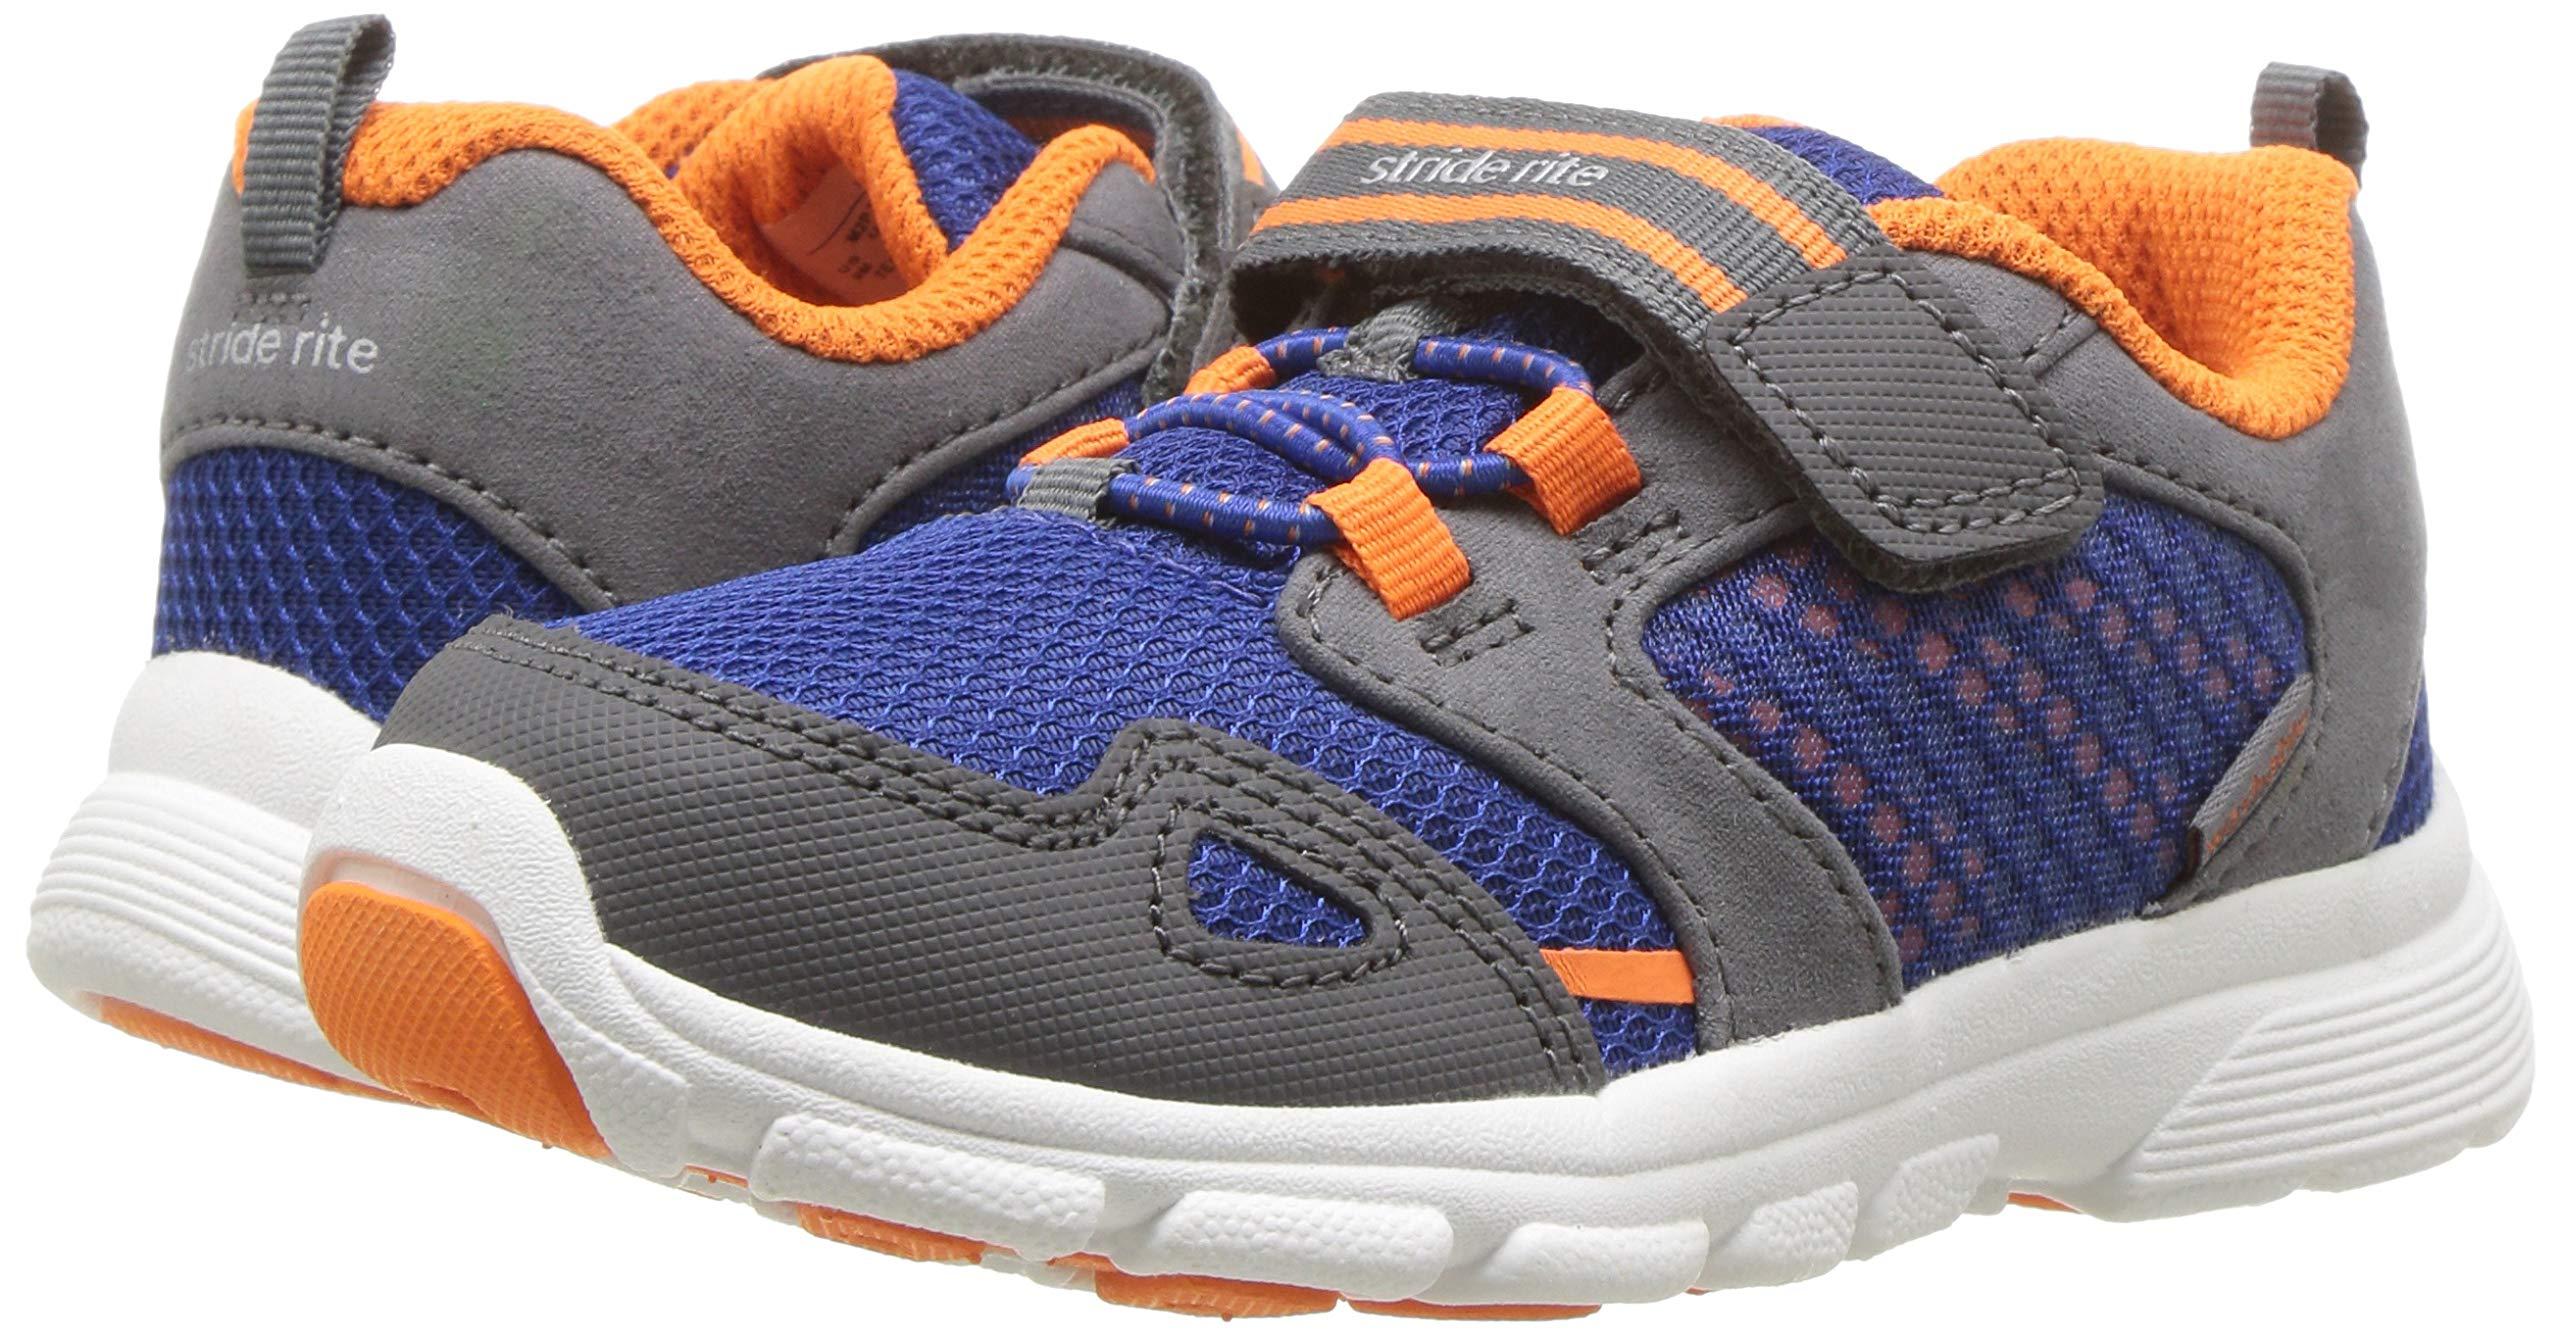 Stride Rite Boys' Made 2 Play Taylor Sneaker, Navy/Orange 7.5 M US Toddler by Stride Rite (Image #5)